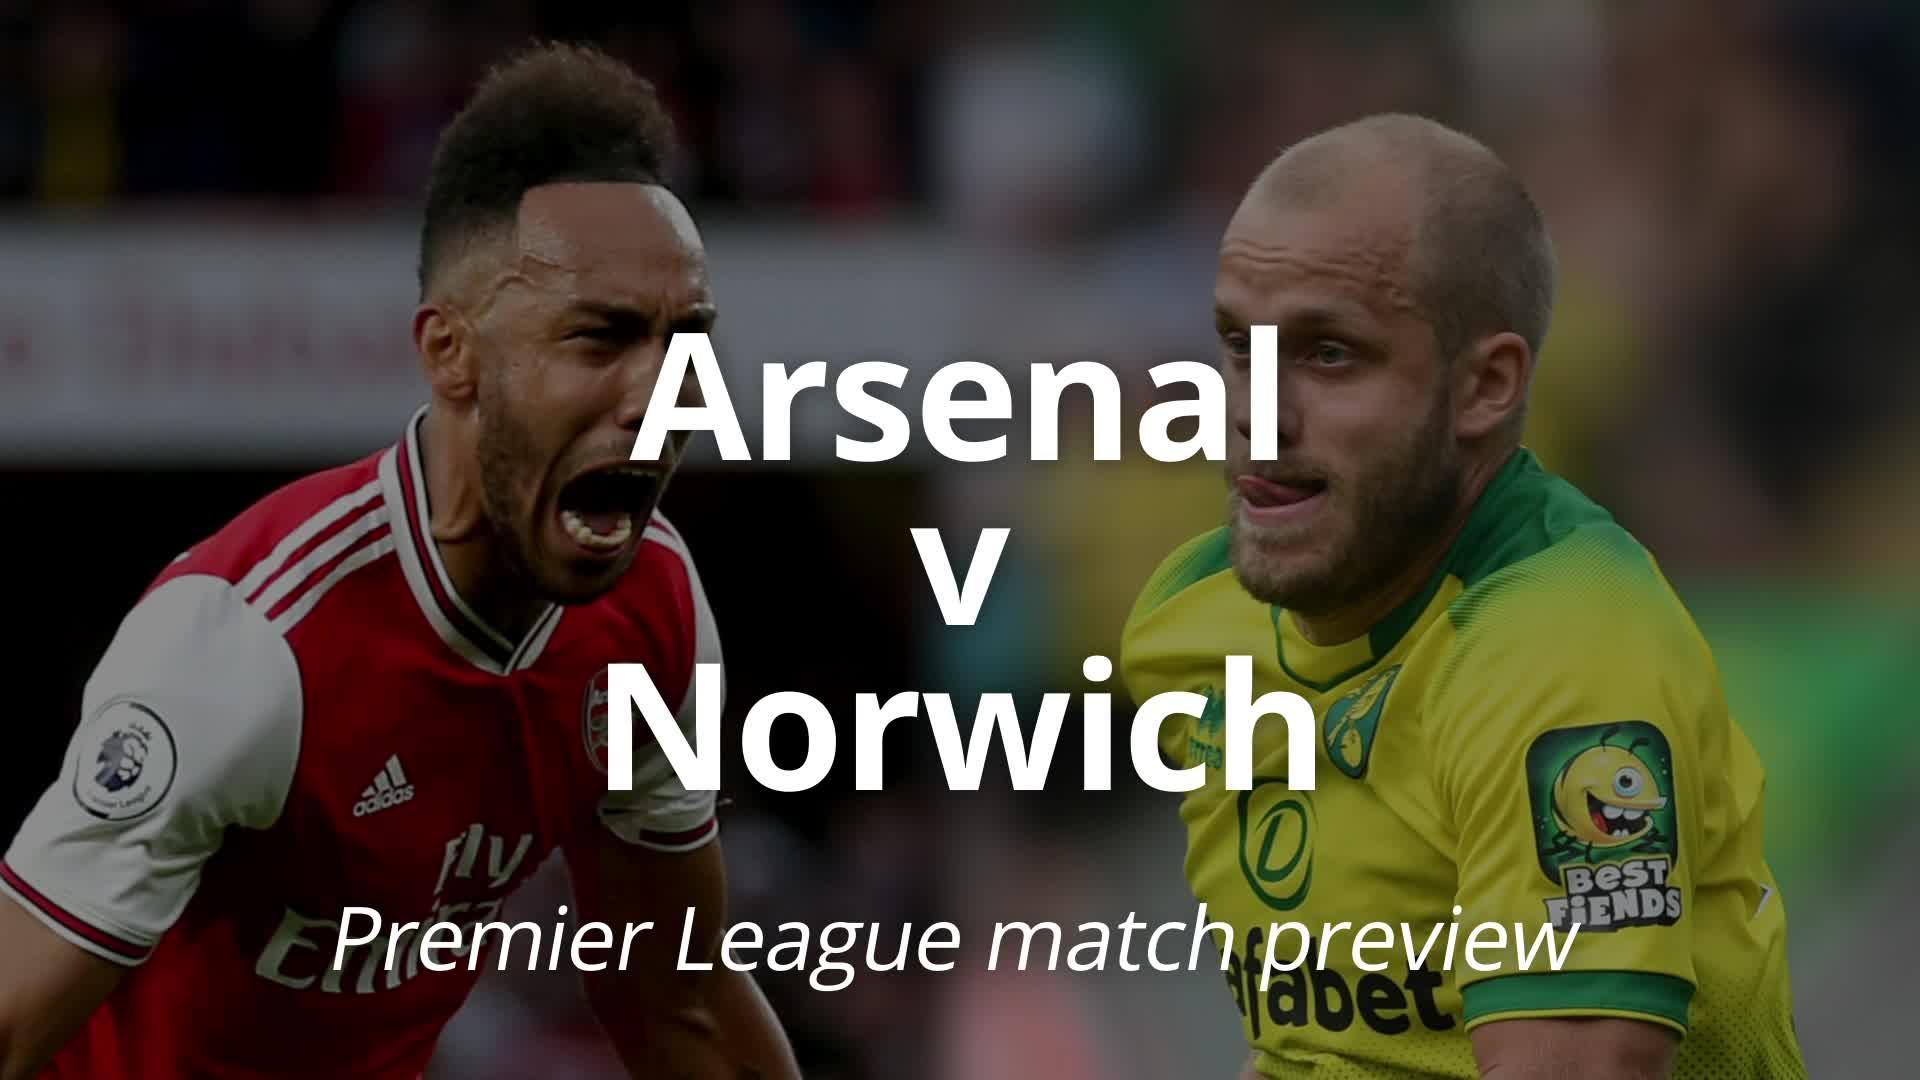 Arsenal v Norwich: Premier League match preview